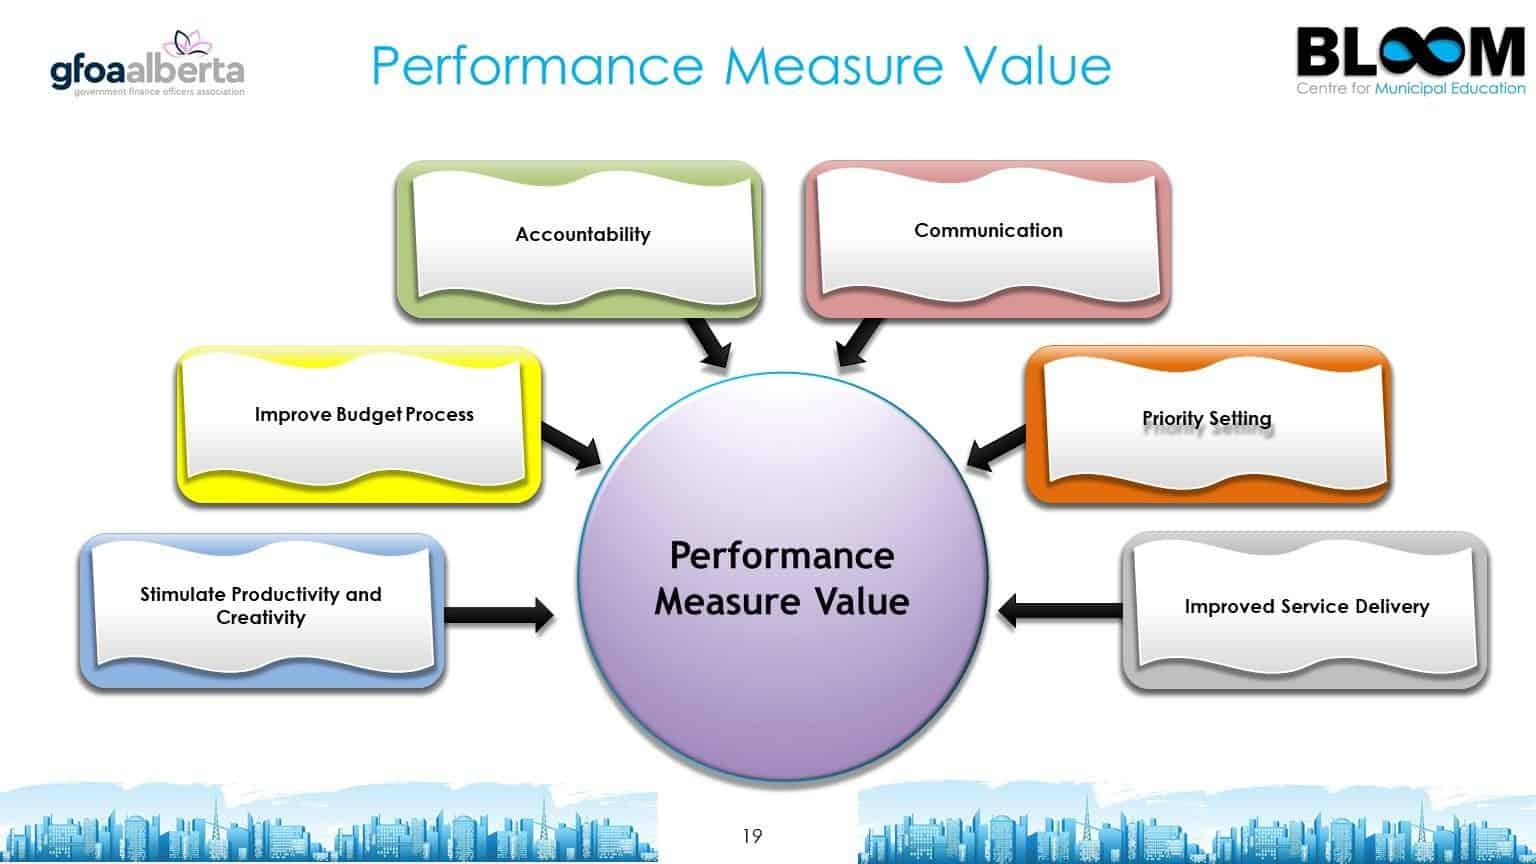 Performance Measure Value